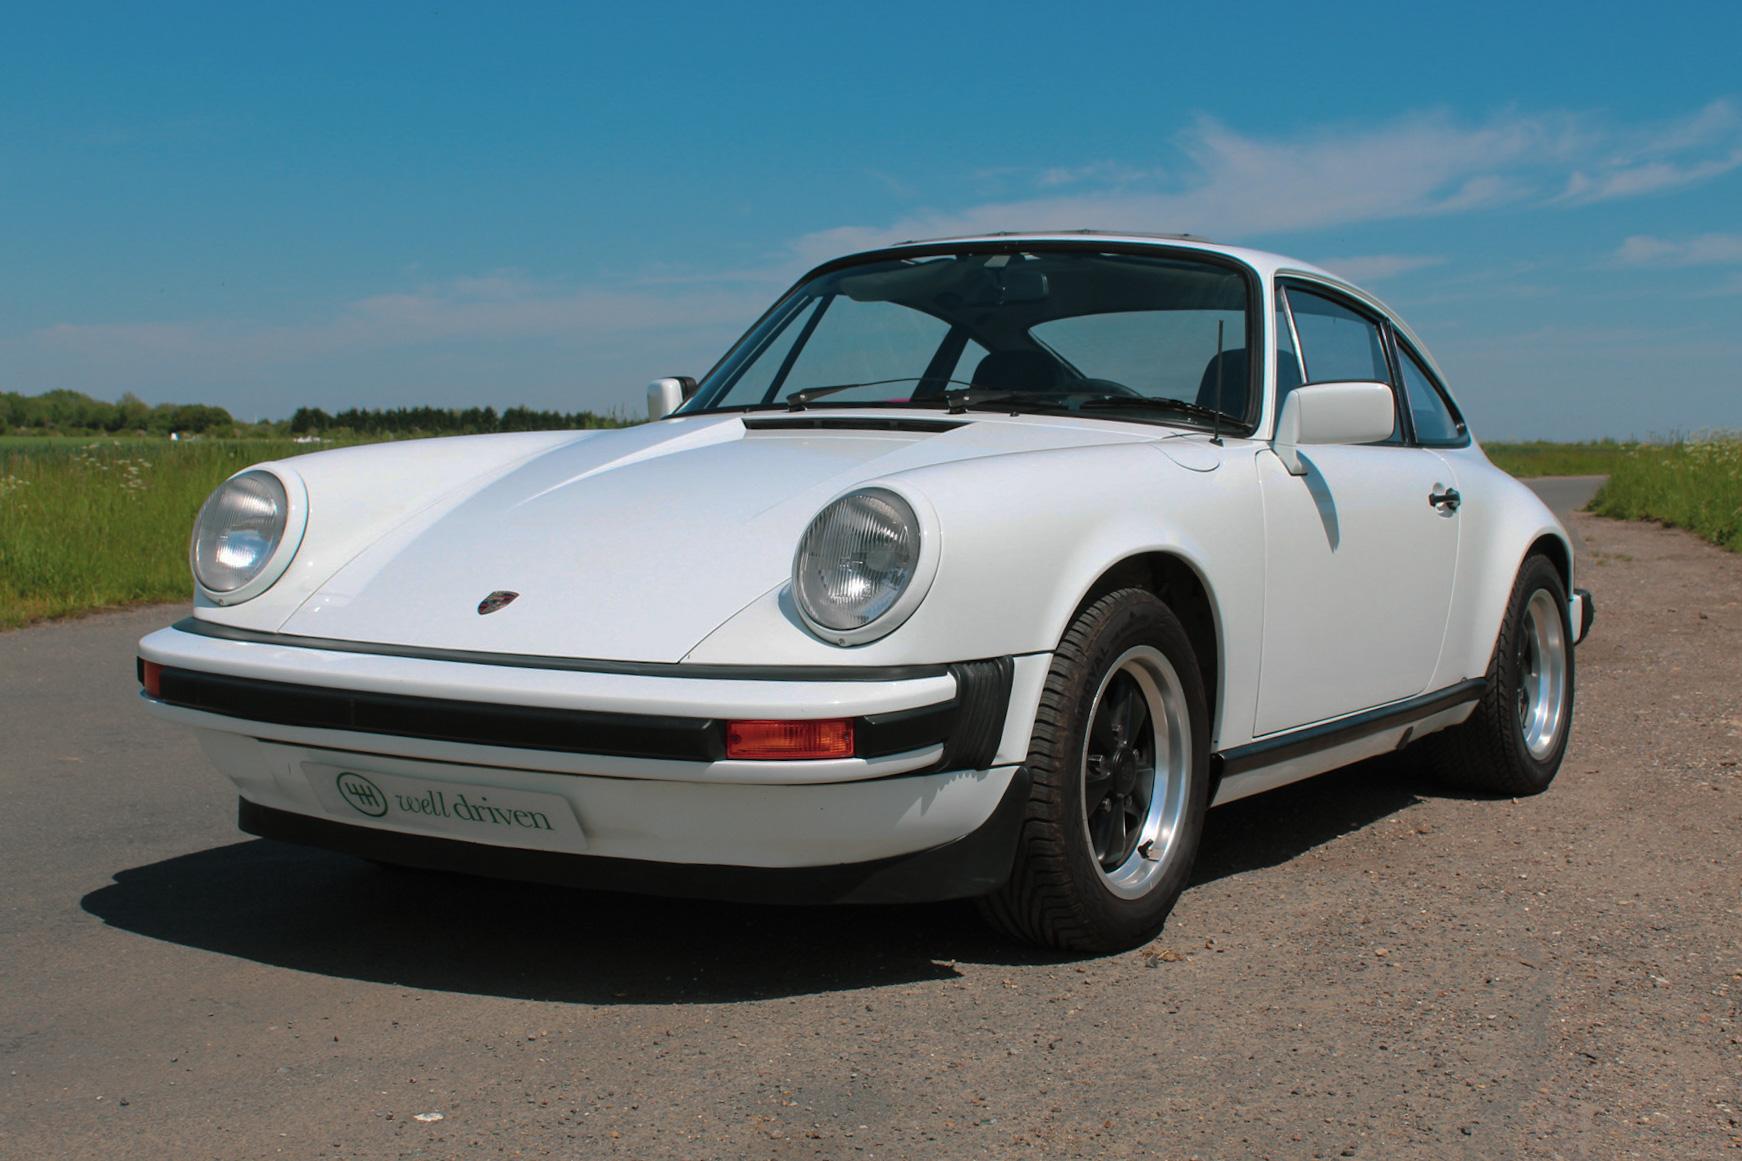 1981 Porsche 911 SC 3.0 Manual full